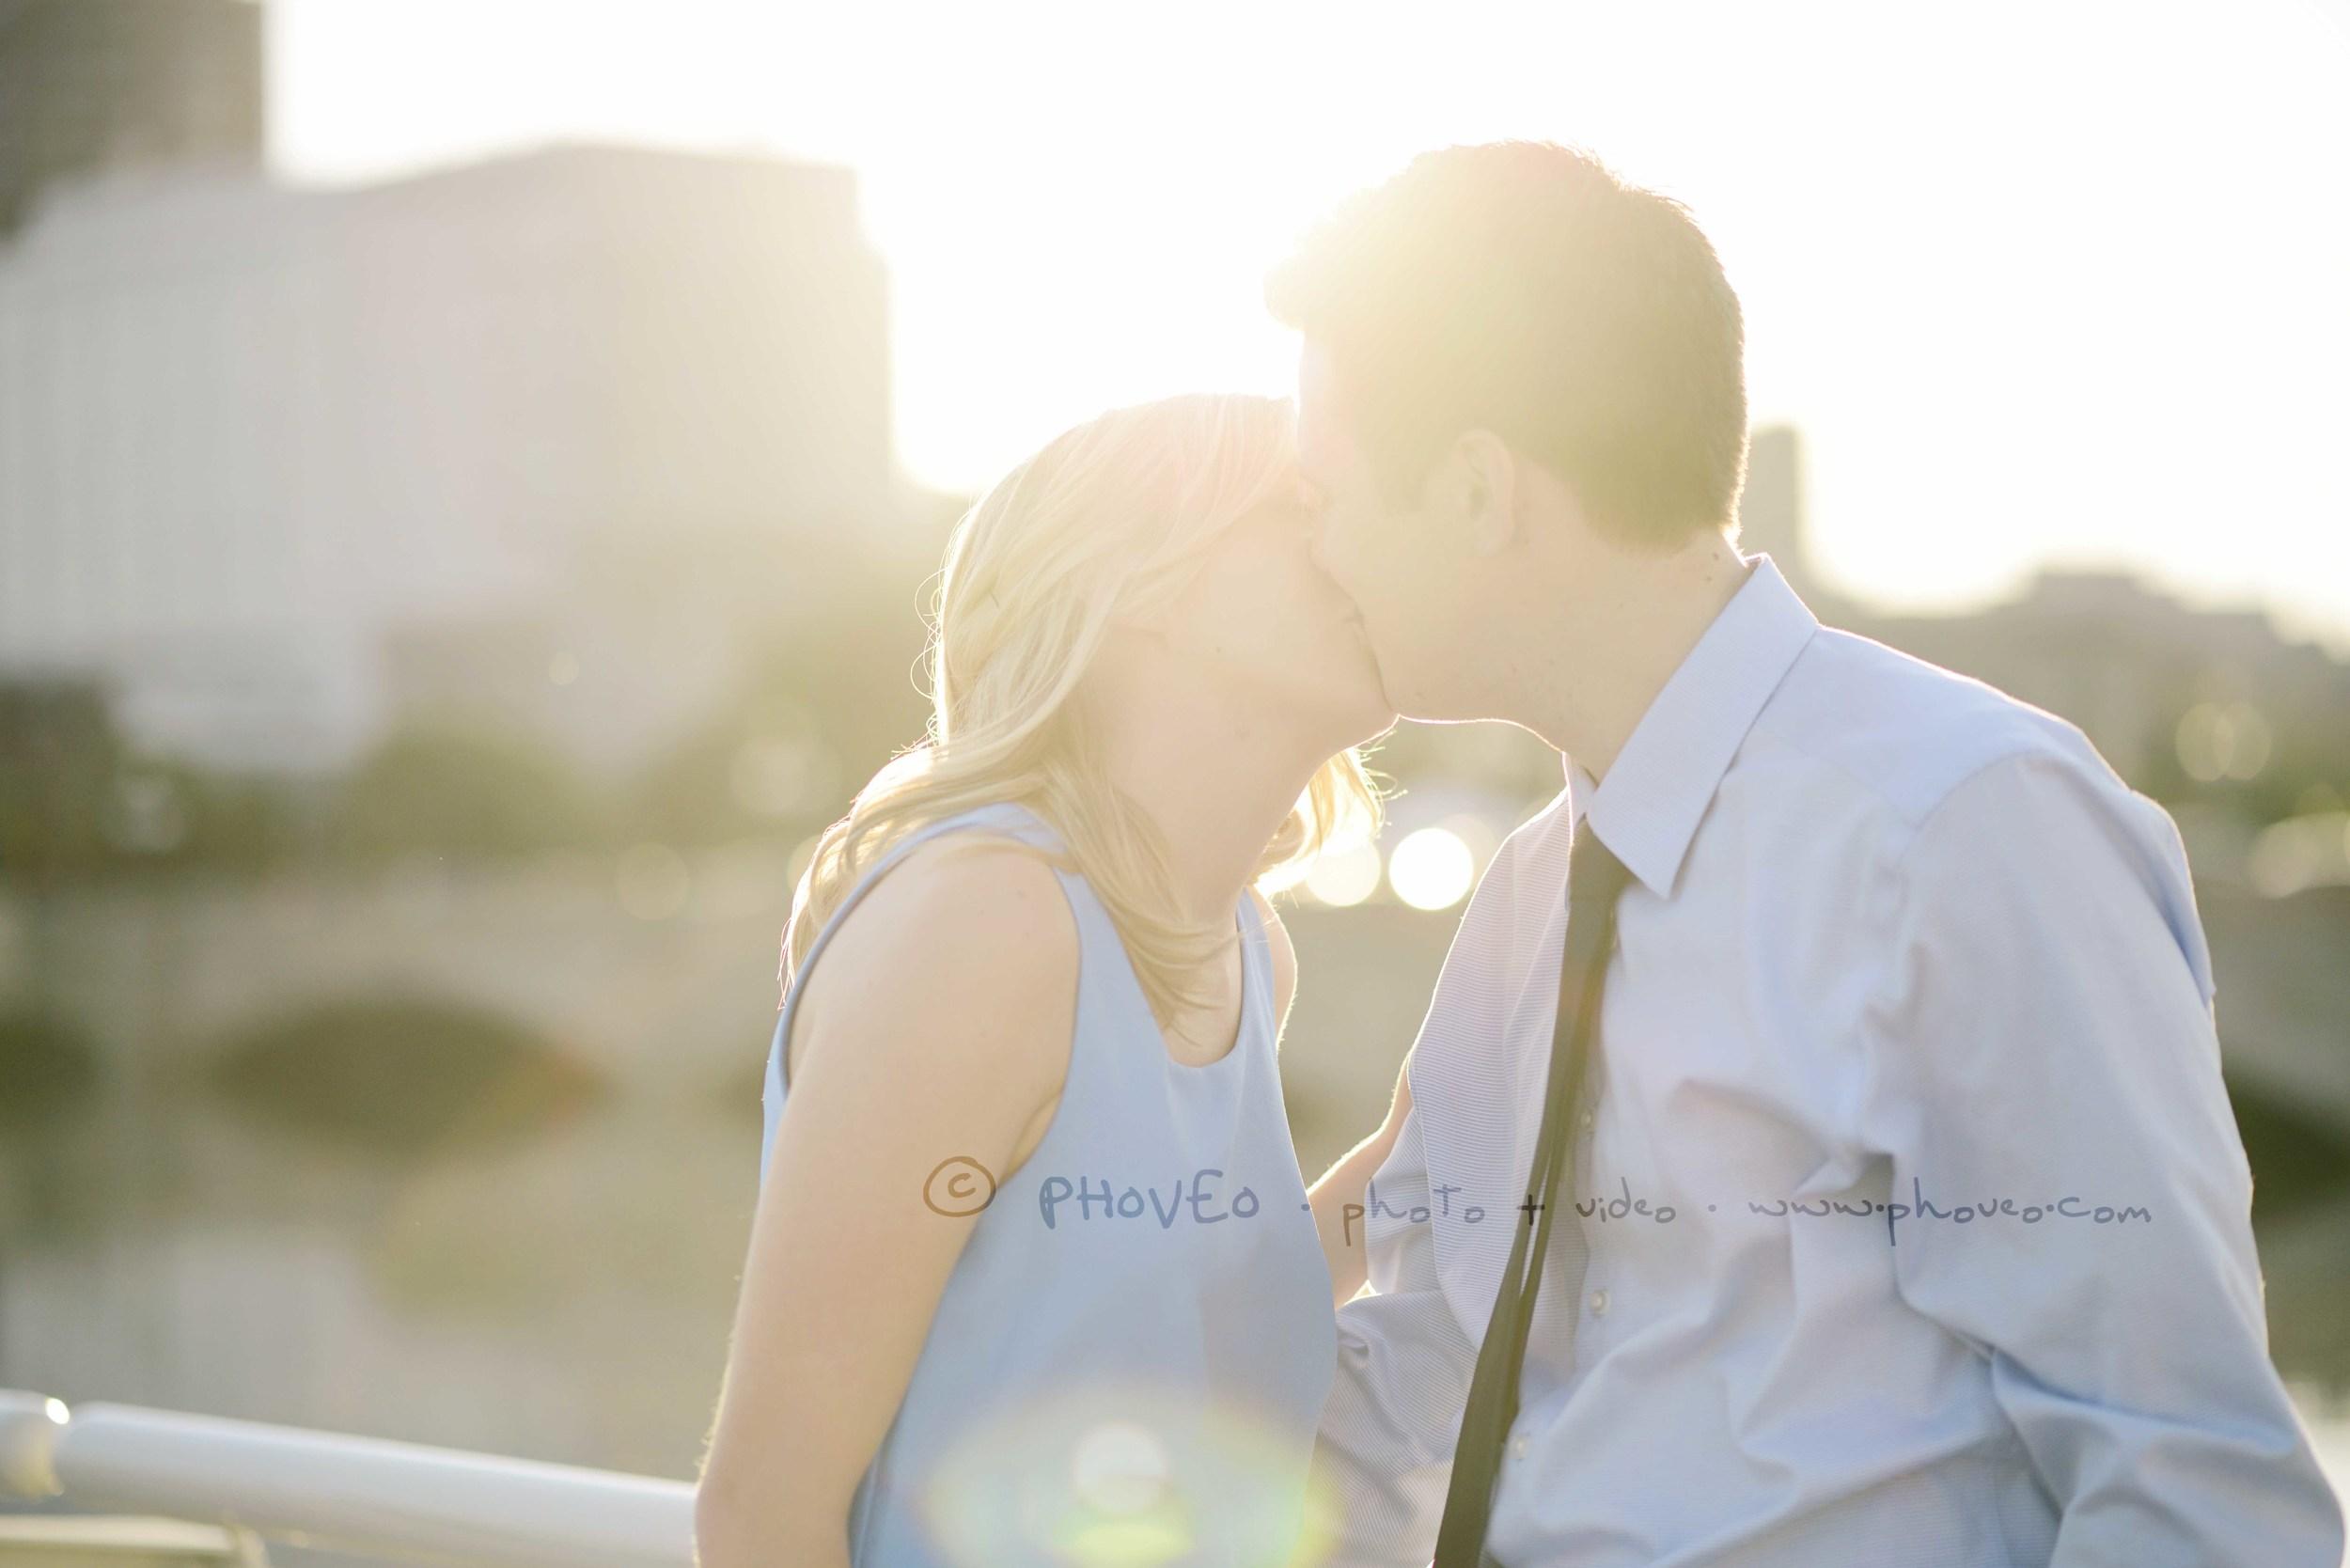 WM_20150627_Amanda+Bryan_35.jpg